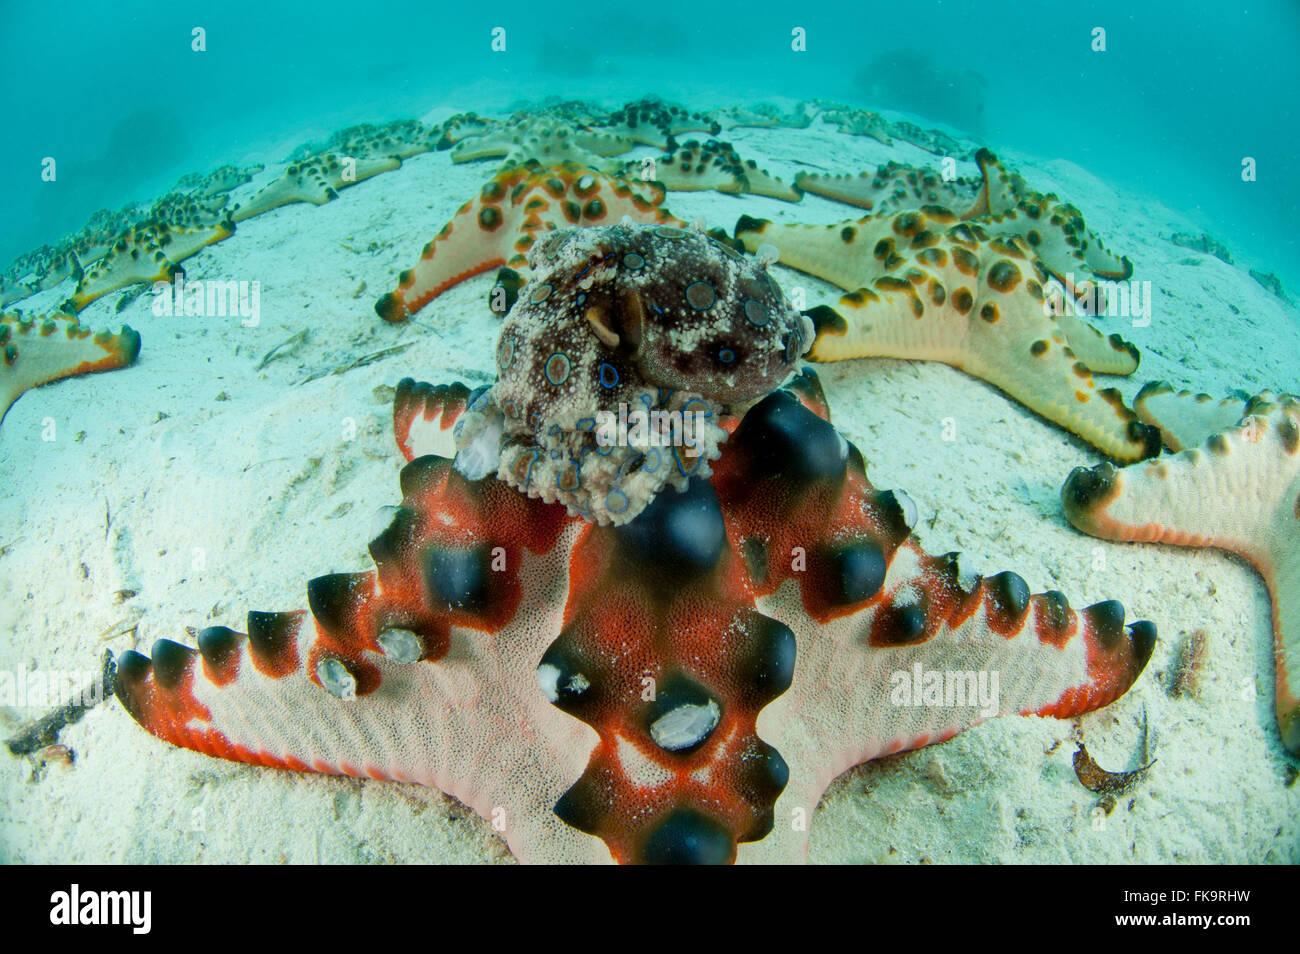 Blue-ringed octopus (Hapalochlaena lunulata)  on a choc chip starfish (Protoreaster nodosus) on white sandy area. - Stock Image